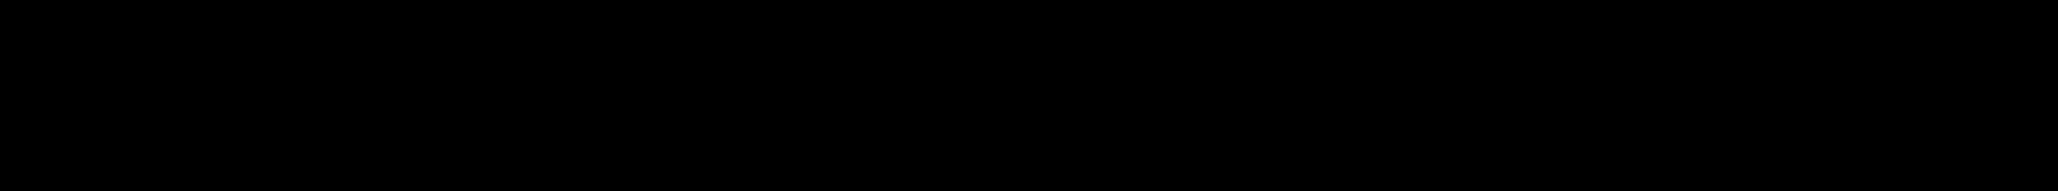 Design System B 300R